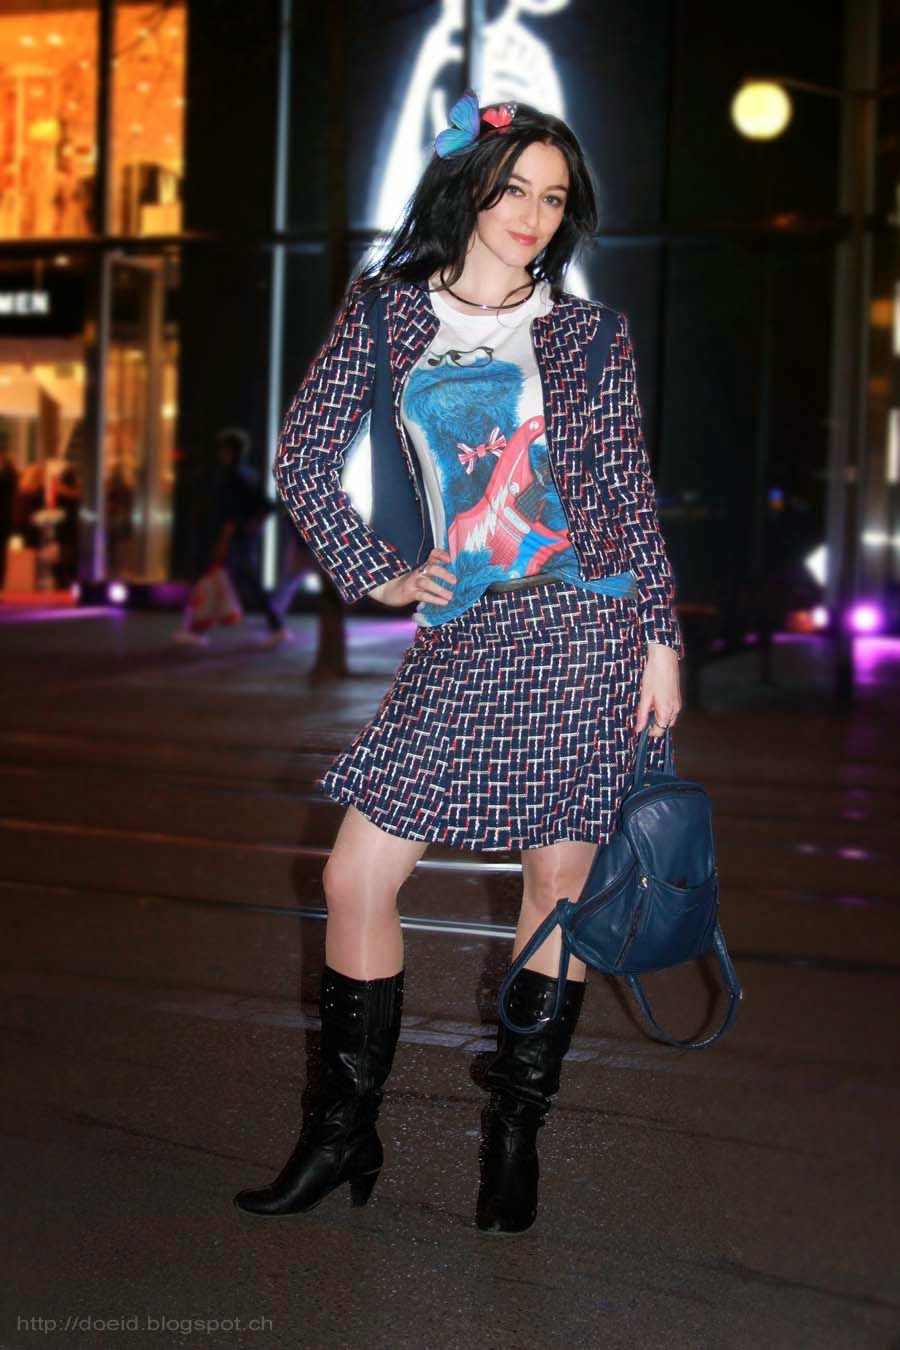 dà id a swiss fashion and lifestyle blog 04 01 2014 05 01 2014